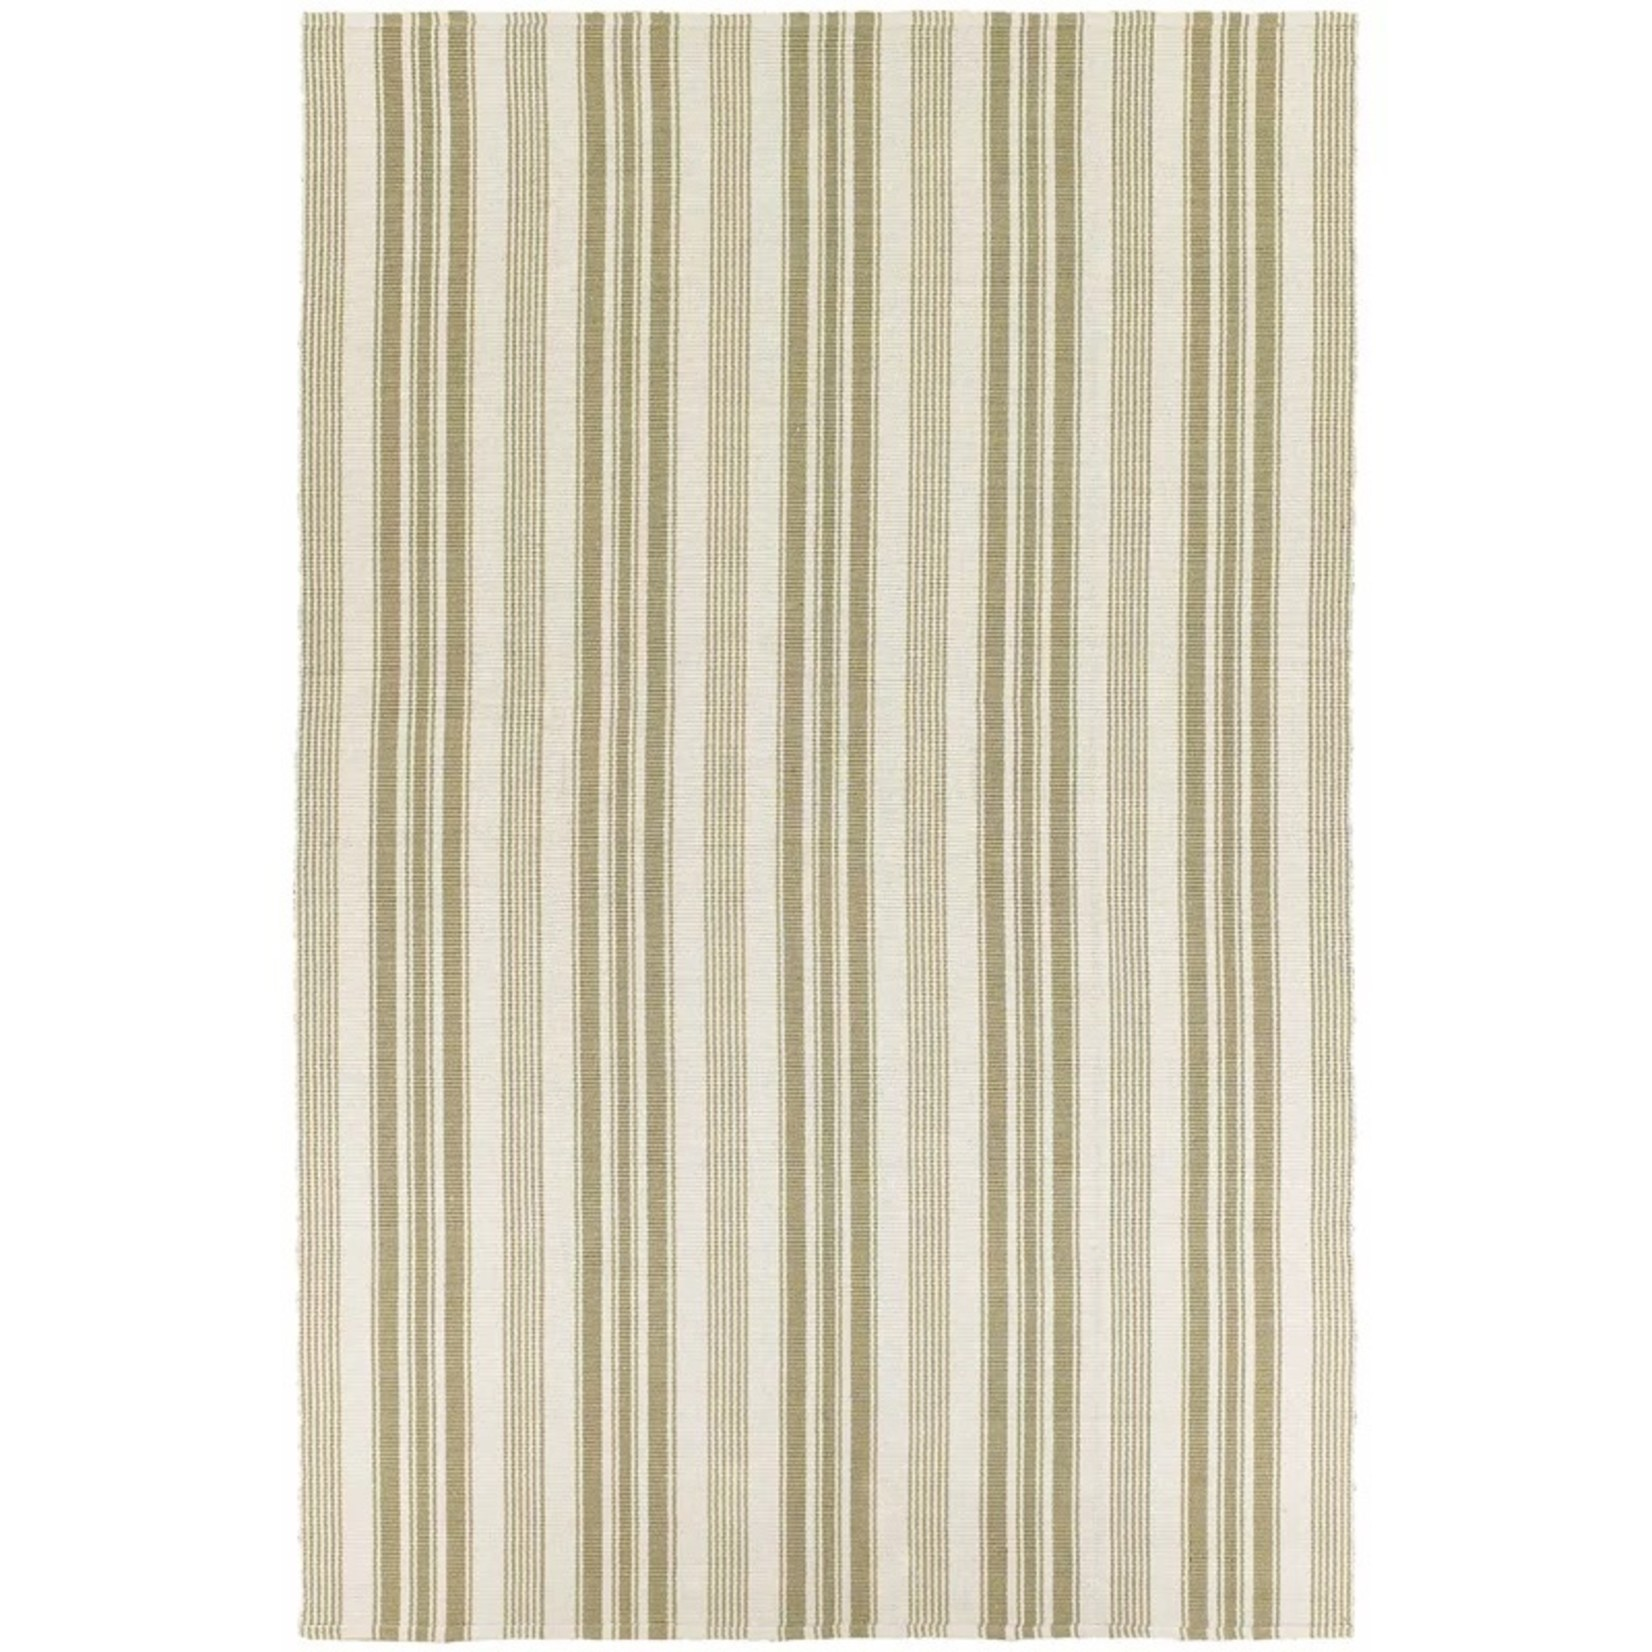 *8' x 10' - Artique Striped Handmade Flatweave Cotton Beige/Green Area Rug